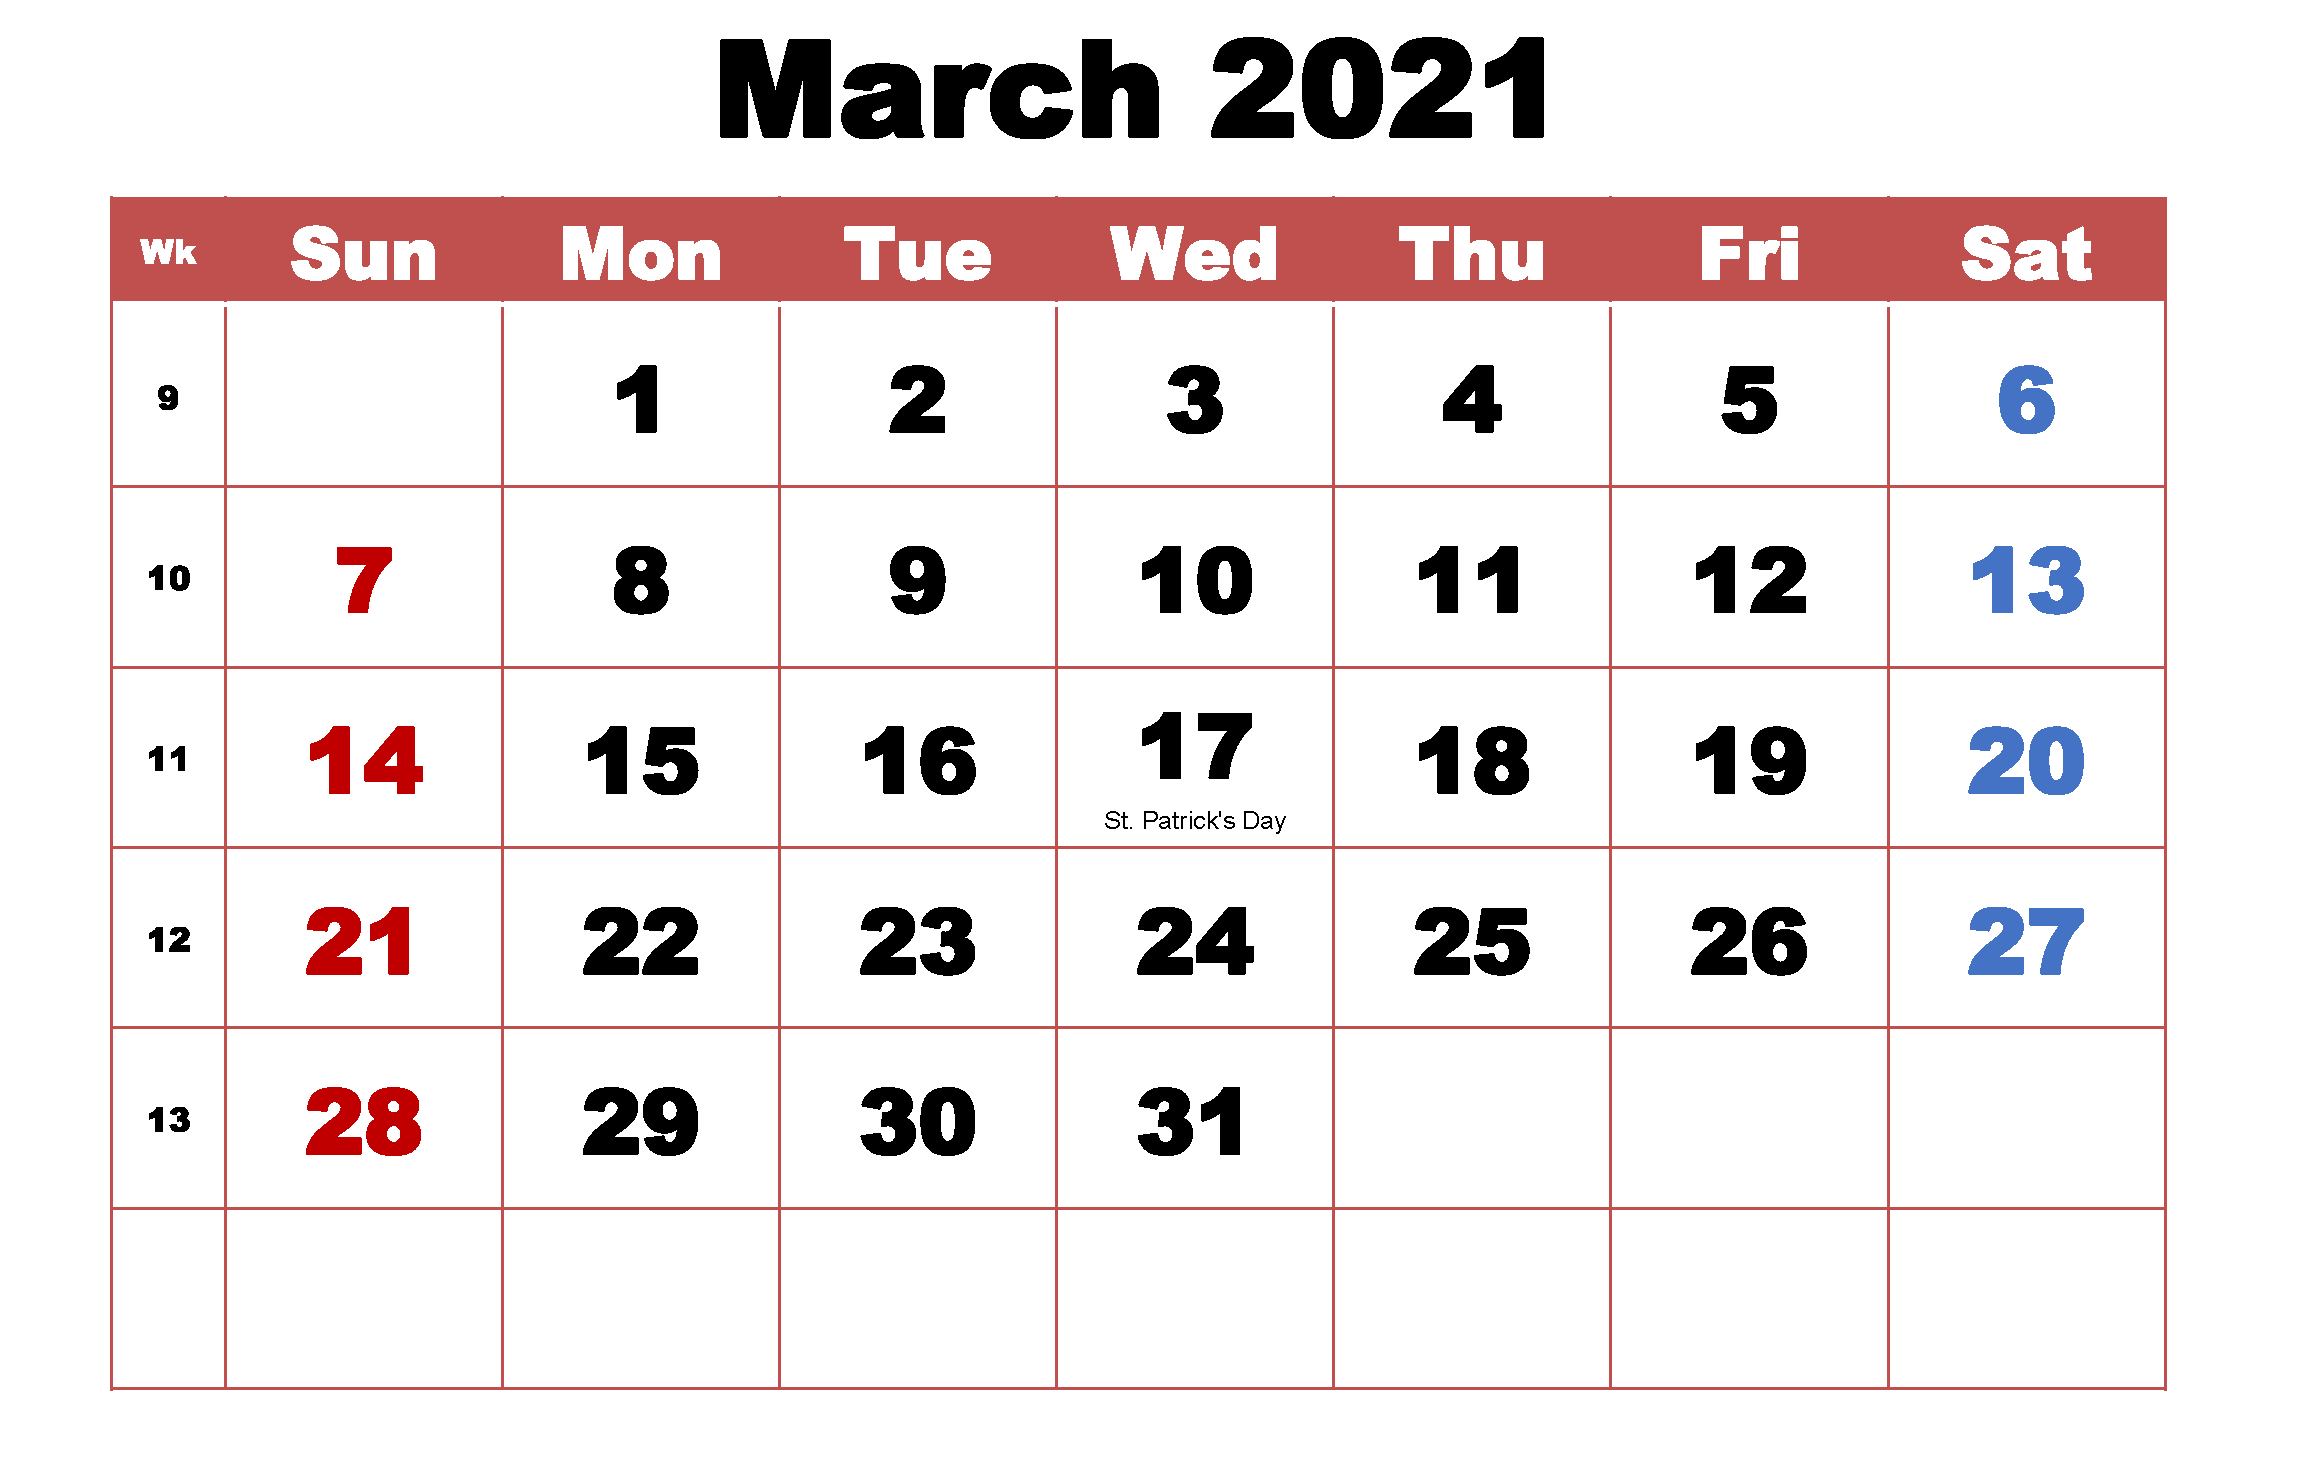 Monthly March 2021 Calendar Template In 2020 2021 Calendar Template Printable Calendar